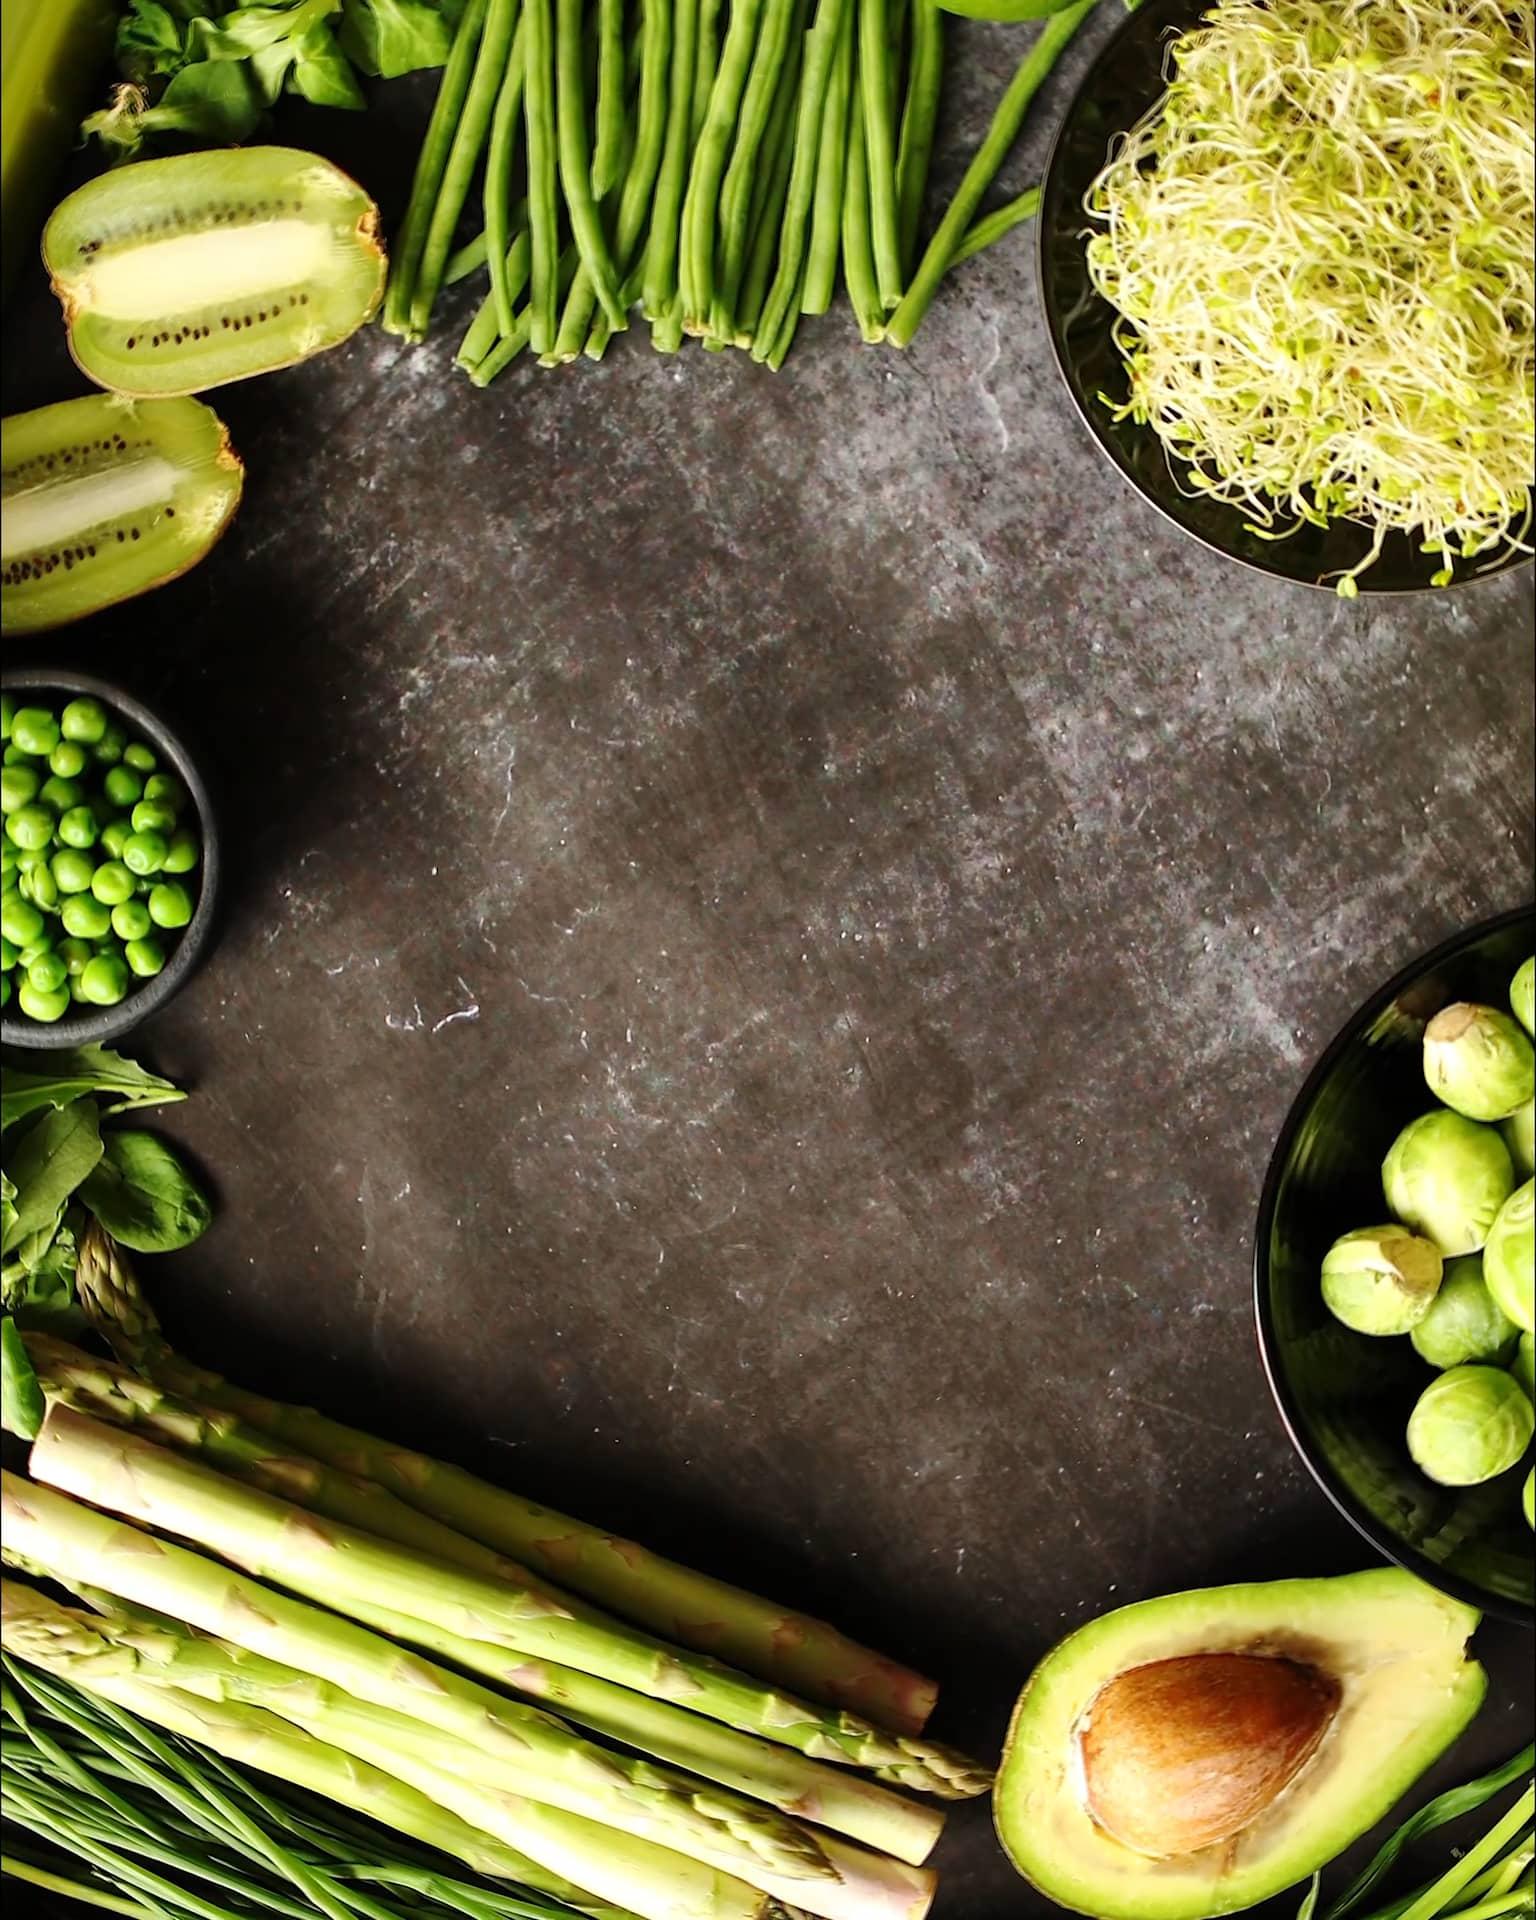 Endless Fresh Food poster